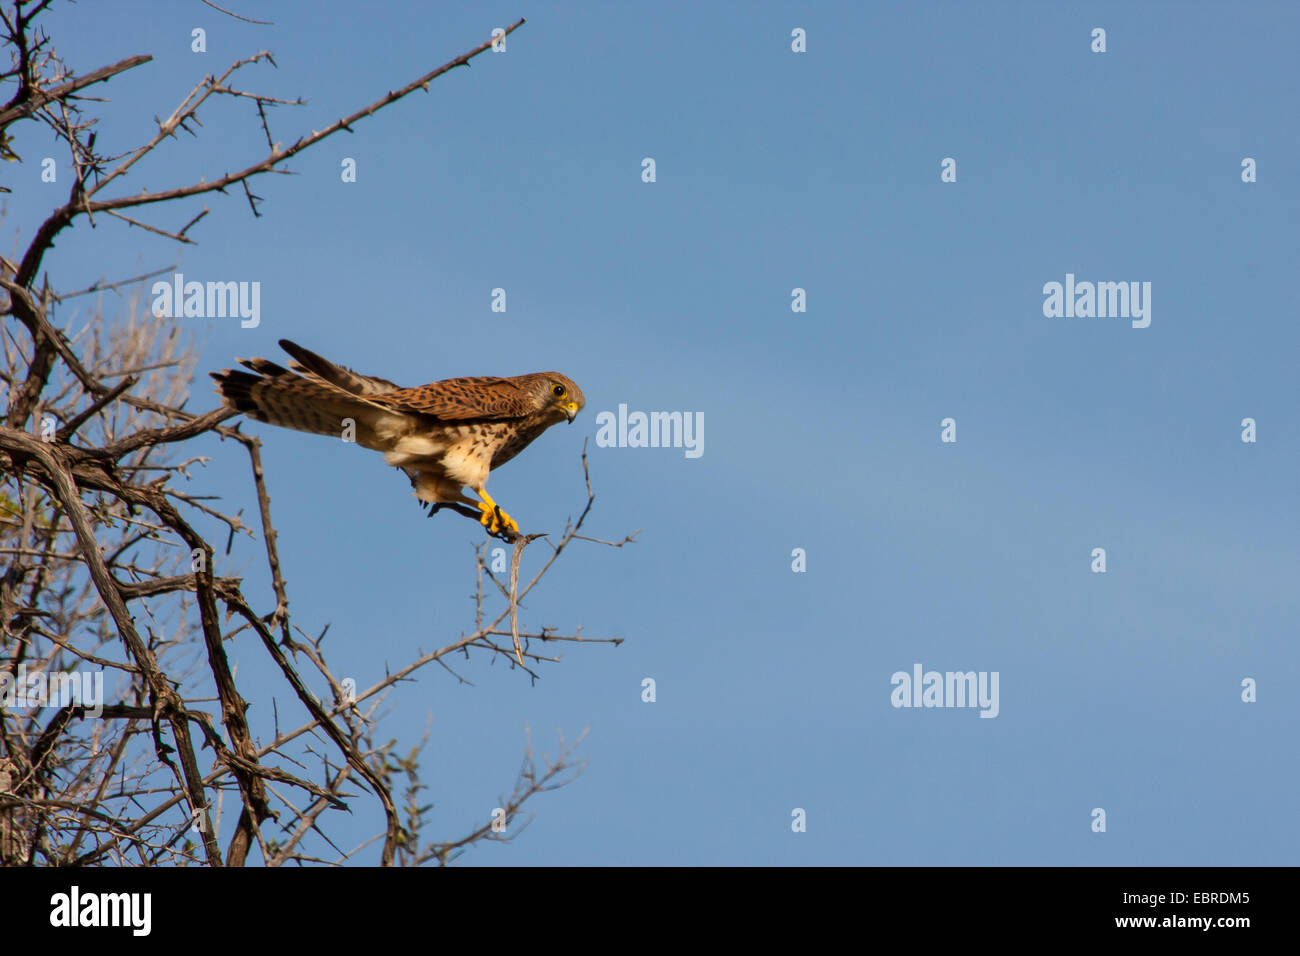 European Kestrel, Eurasian Kestrel, Old World Kestrel, Common Kestrel (Falco tinnunculus), sits on an outlook, Spain, - Stock Image